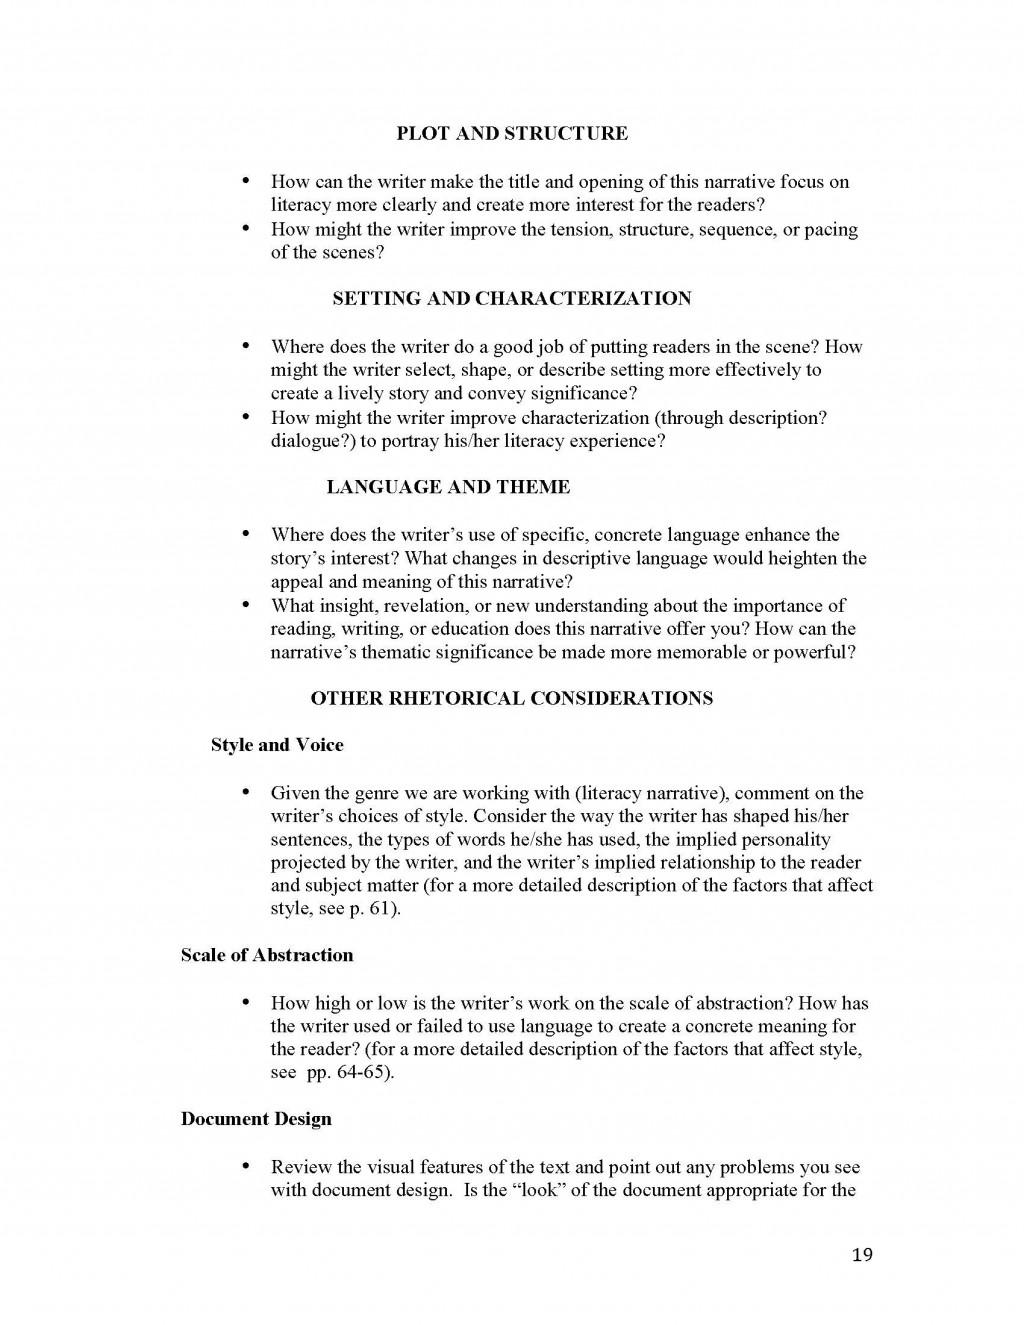 006 Unit 1 Literacy Narrative Instructor Copy Page 19 Argumentative Essay Definition Fearsome Define Persuasive/argumentative Pdf Large